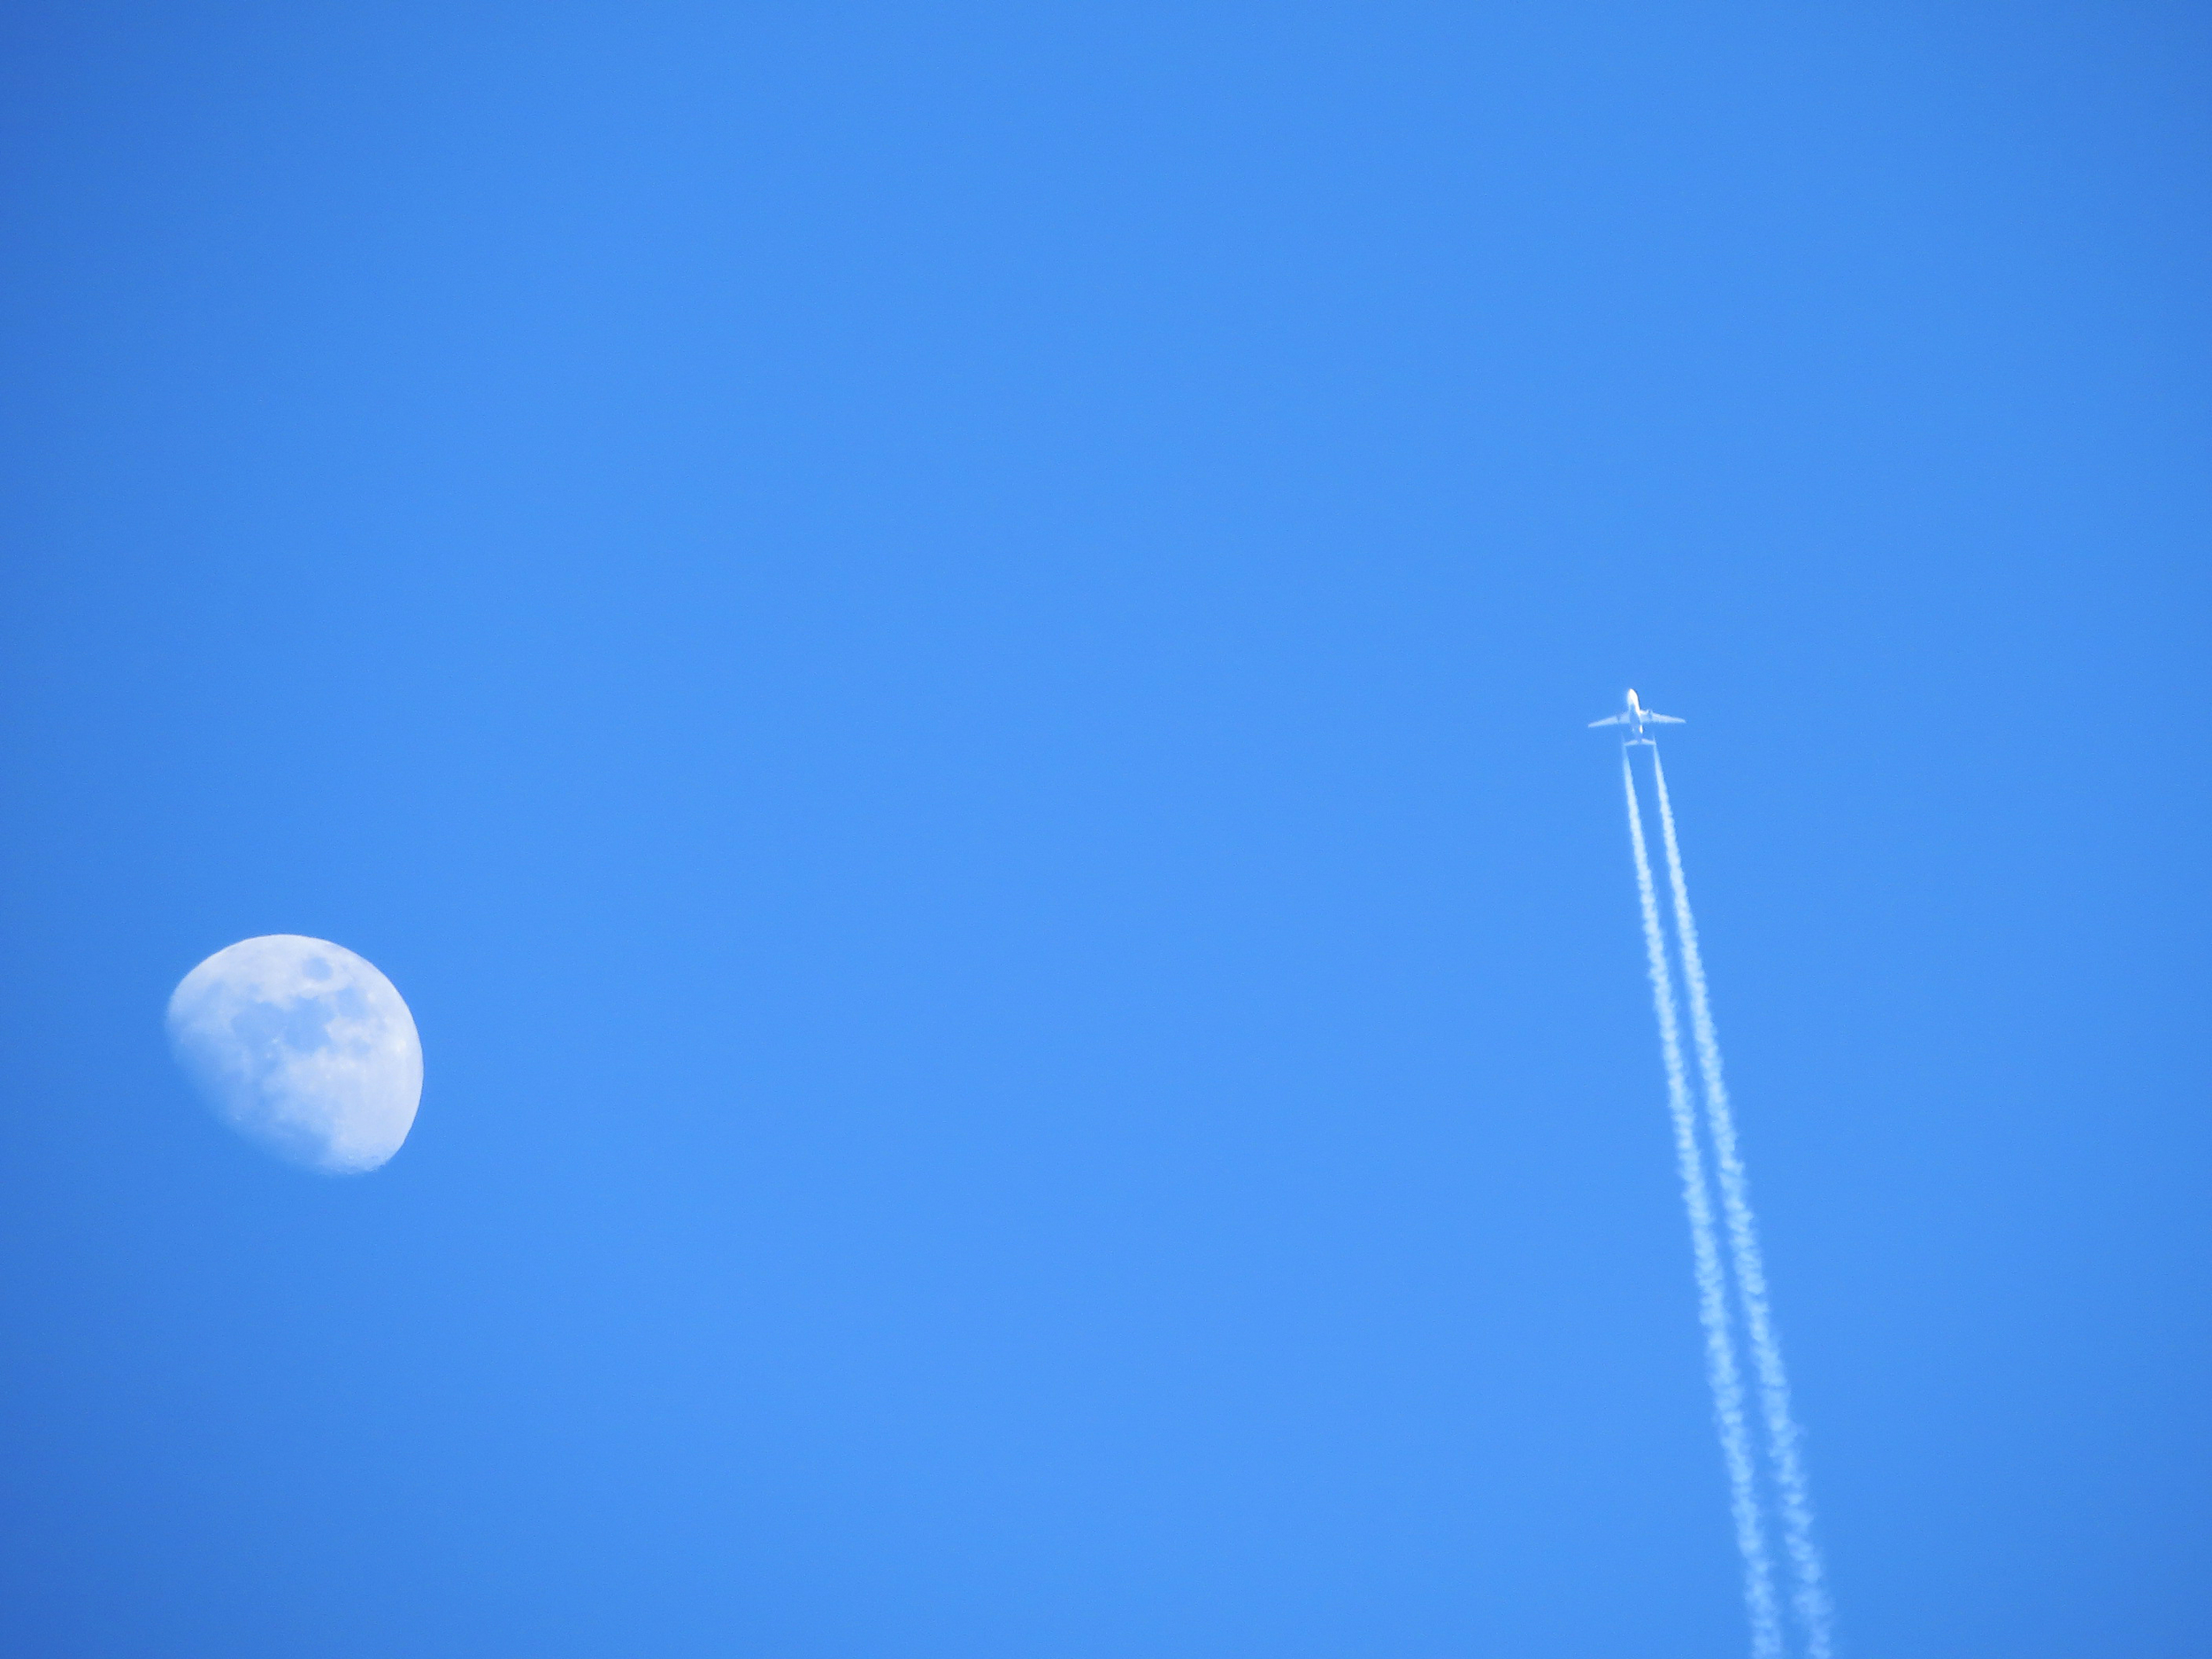 moon plane.jpg